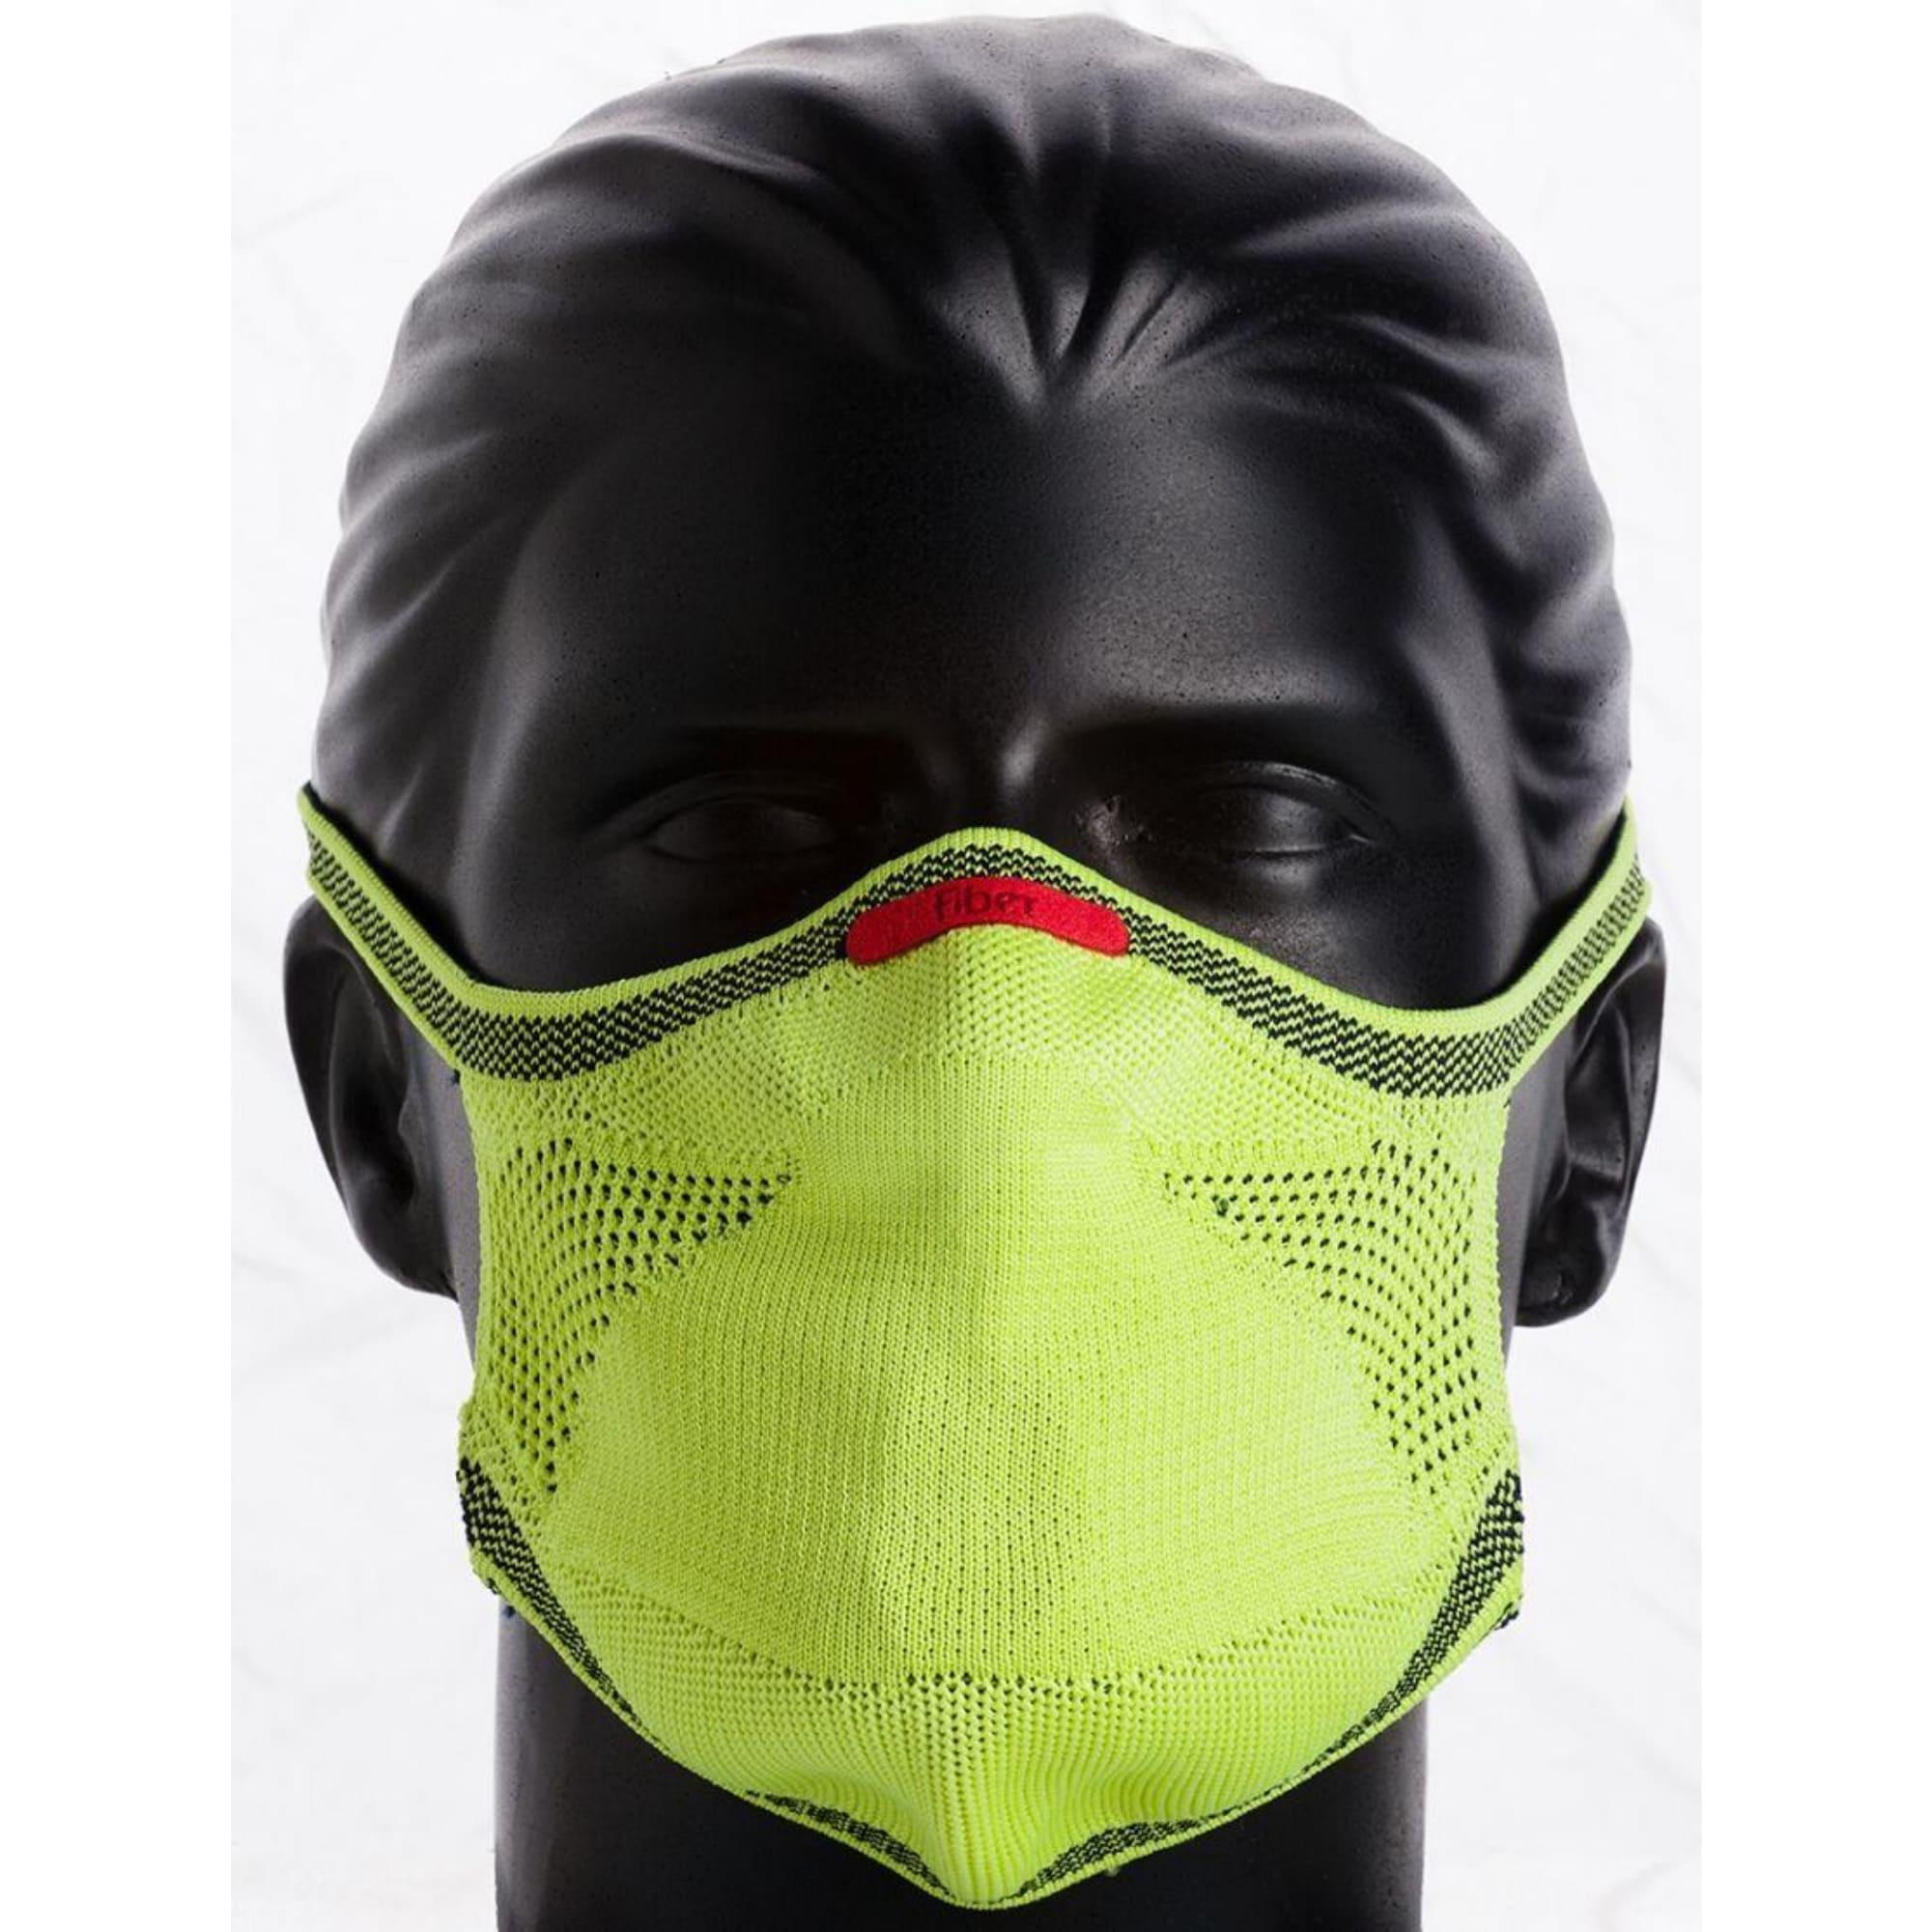 KIT Máscara Verde Limão + Refil de Filtro + Suporte